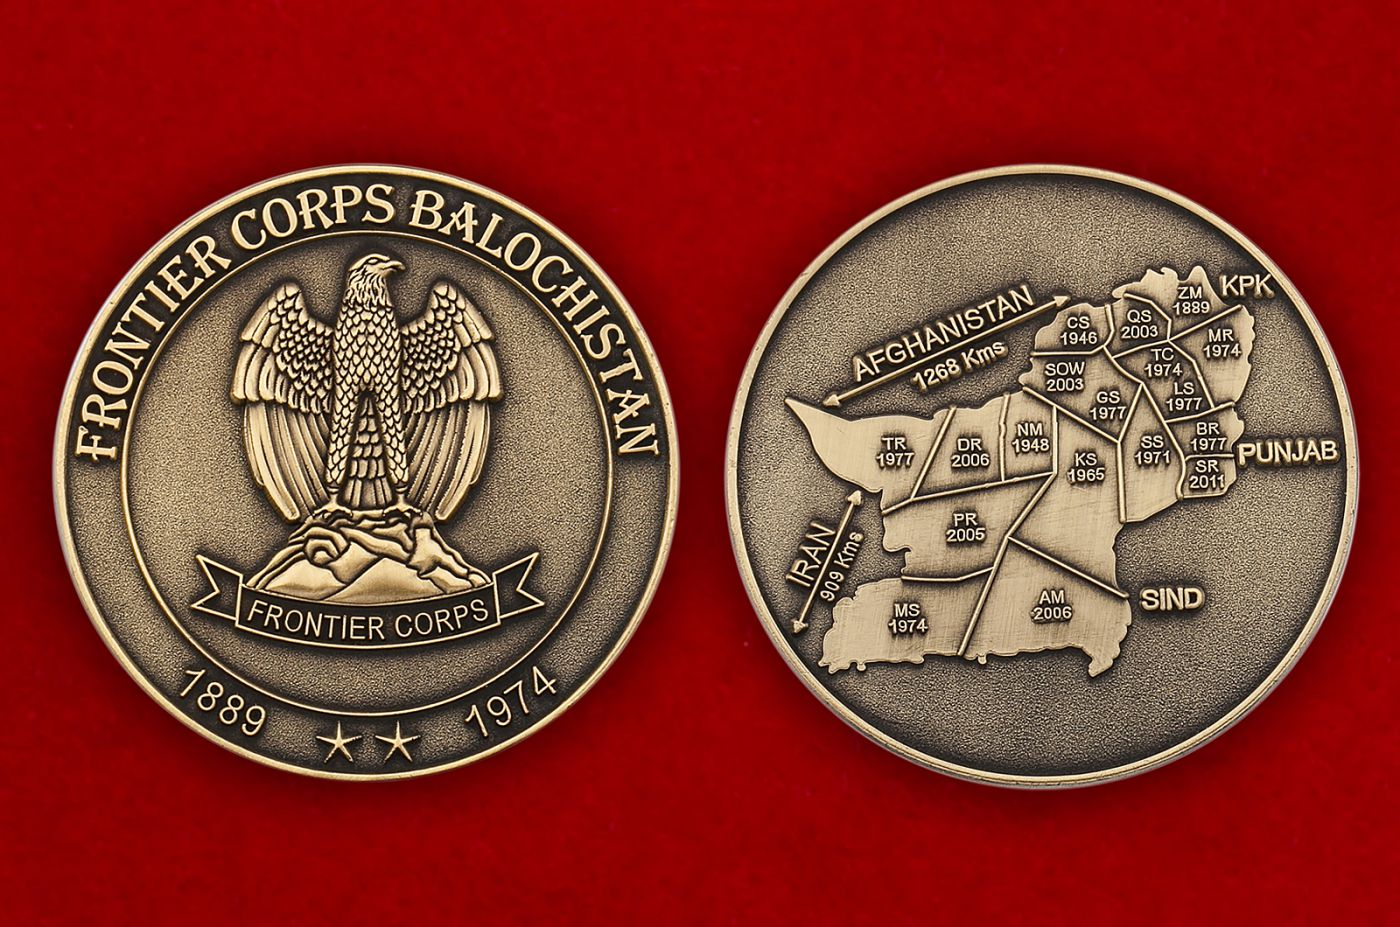 Челлендж коин Пограничного корпуса провинции Белуджистан (Пакистан) - аверс и реверс